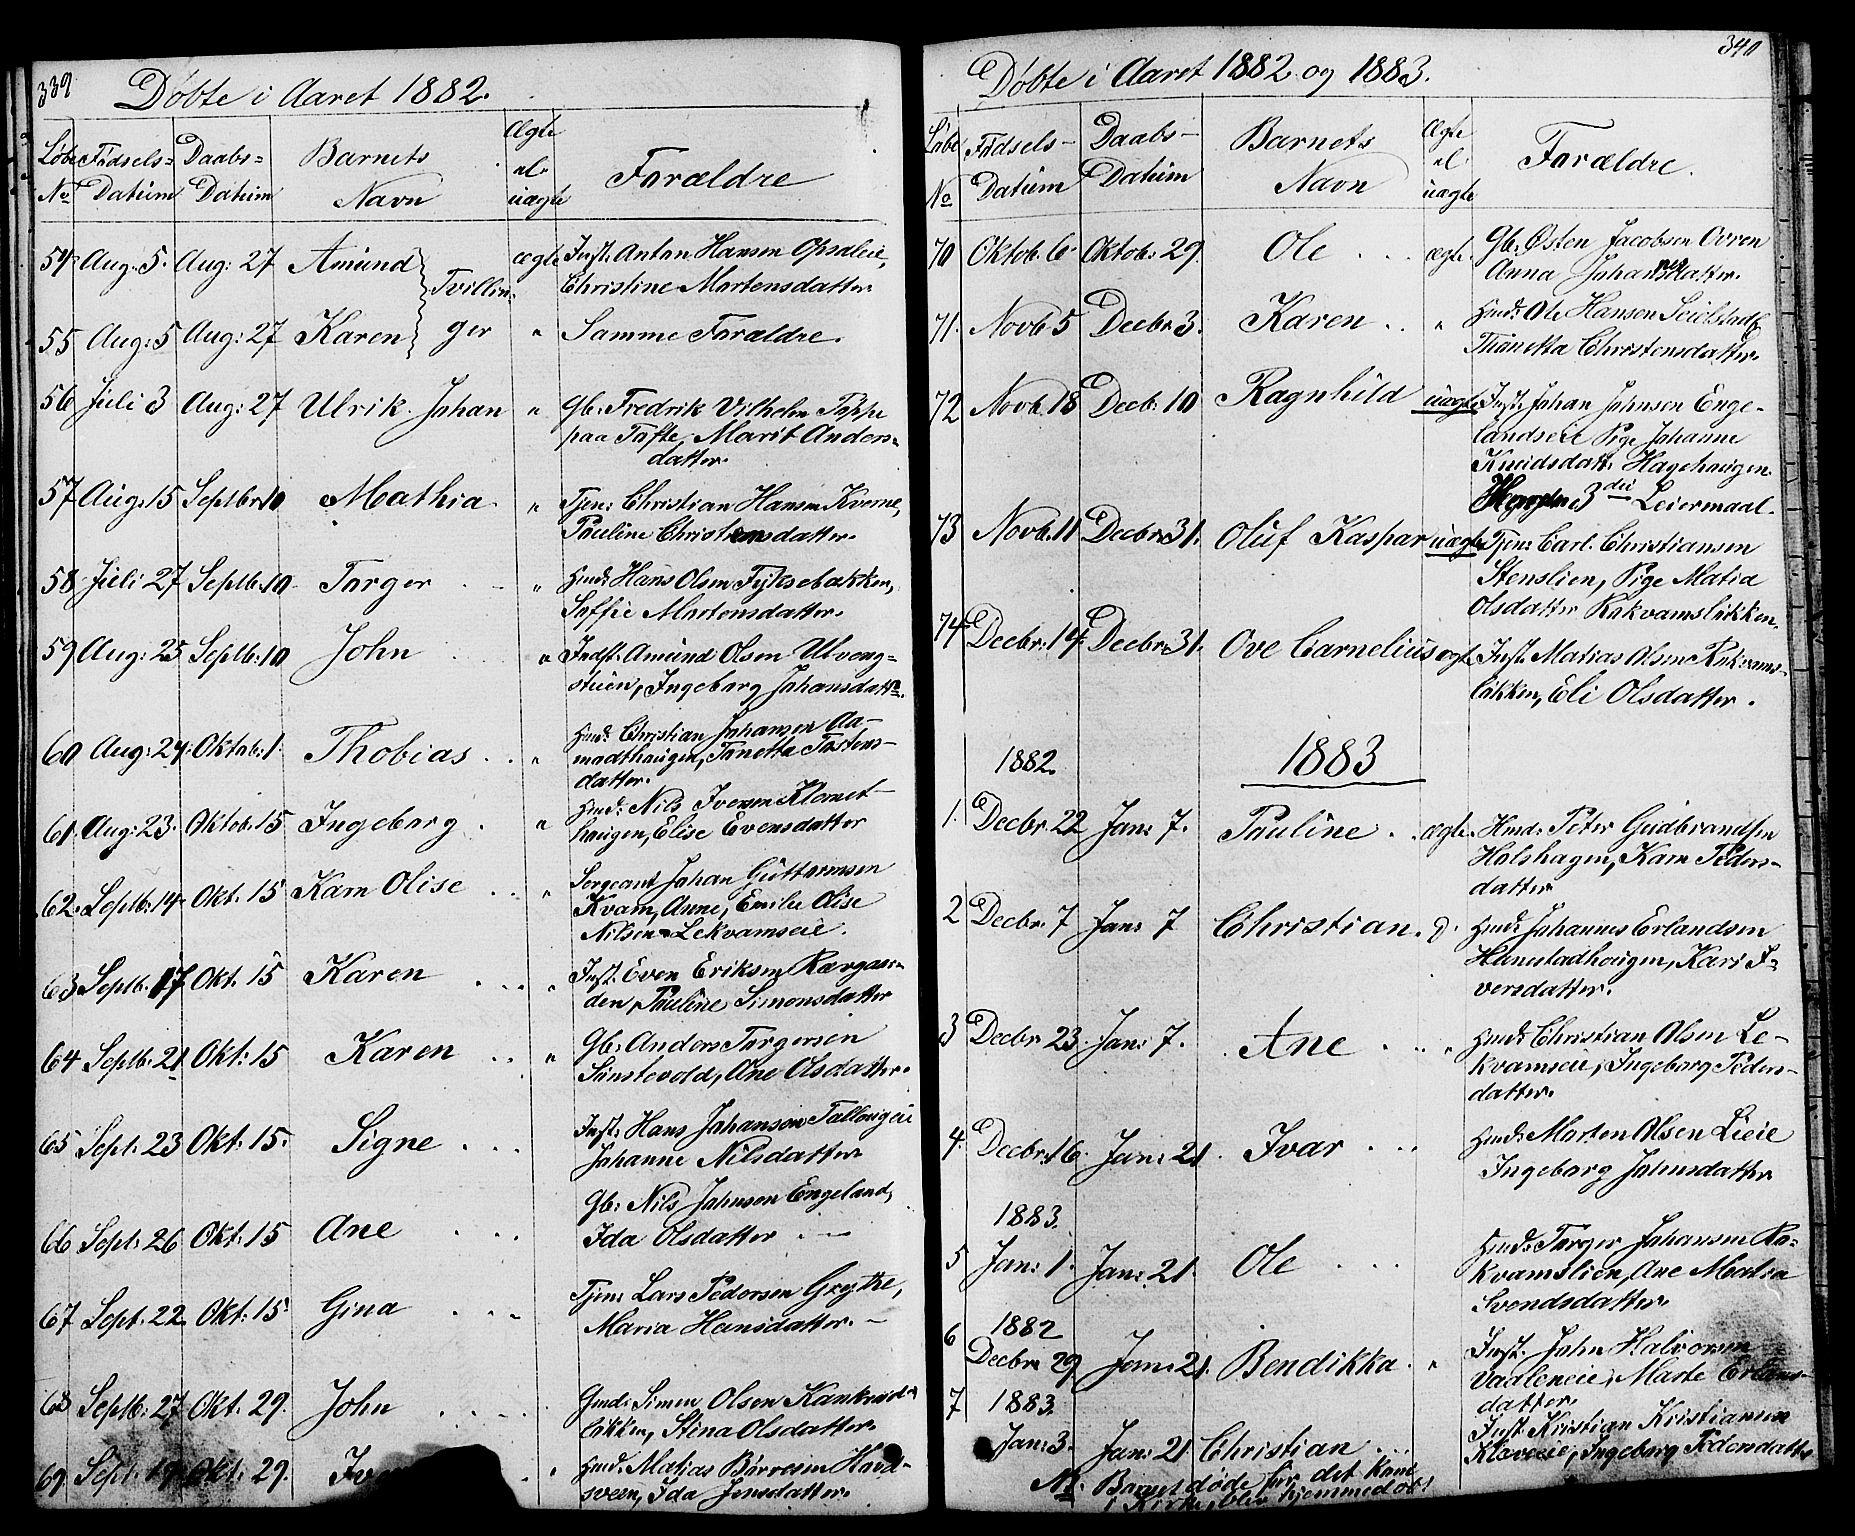 SAH, Østre Gausdal prestekontor, Klokkerbok nr. 1, 1863-1893, s. 339-340